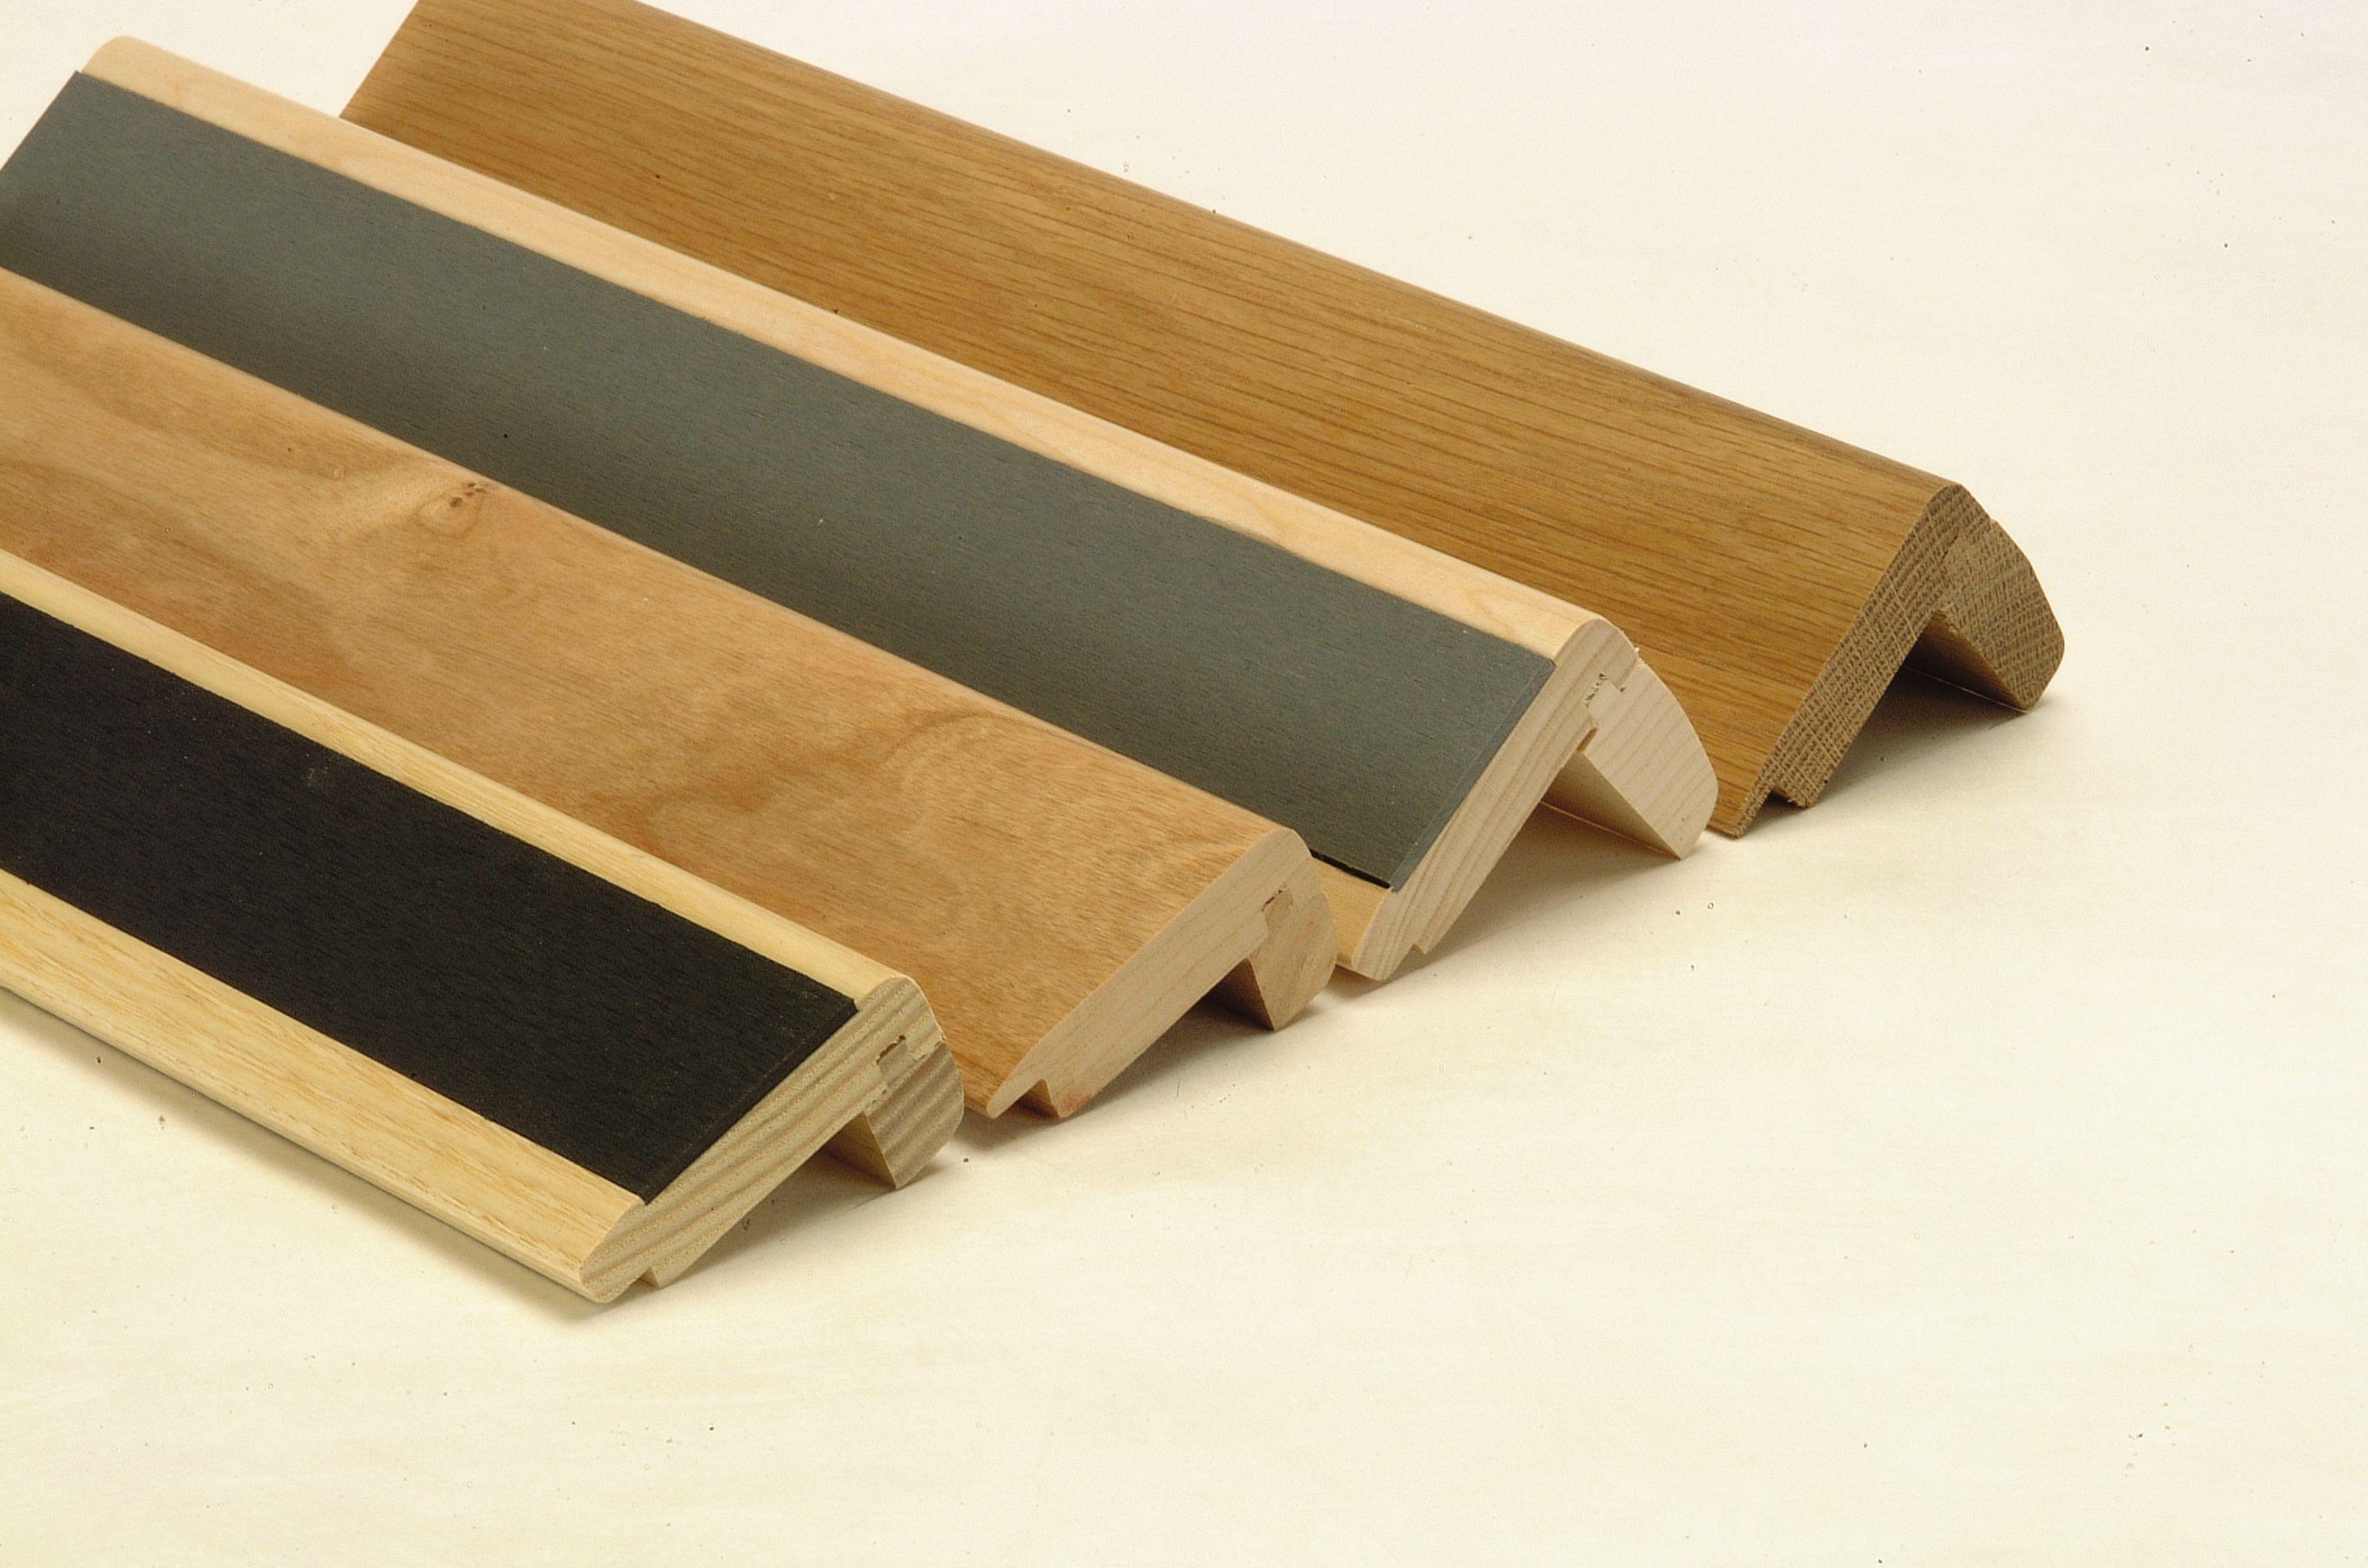 Frontier Wood Stair Nosing Profiles